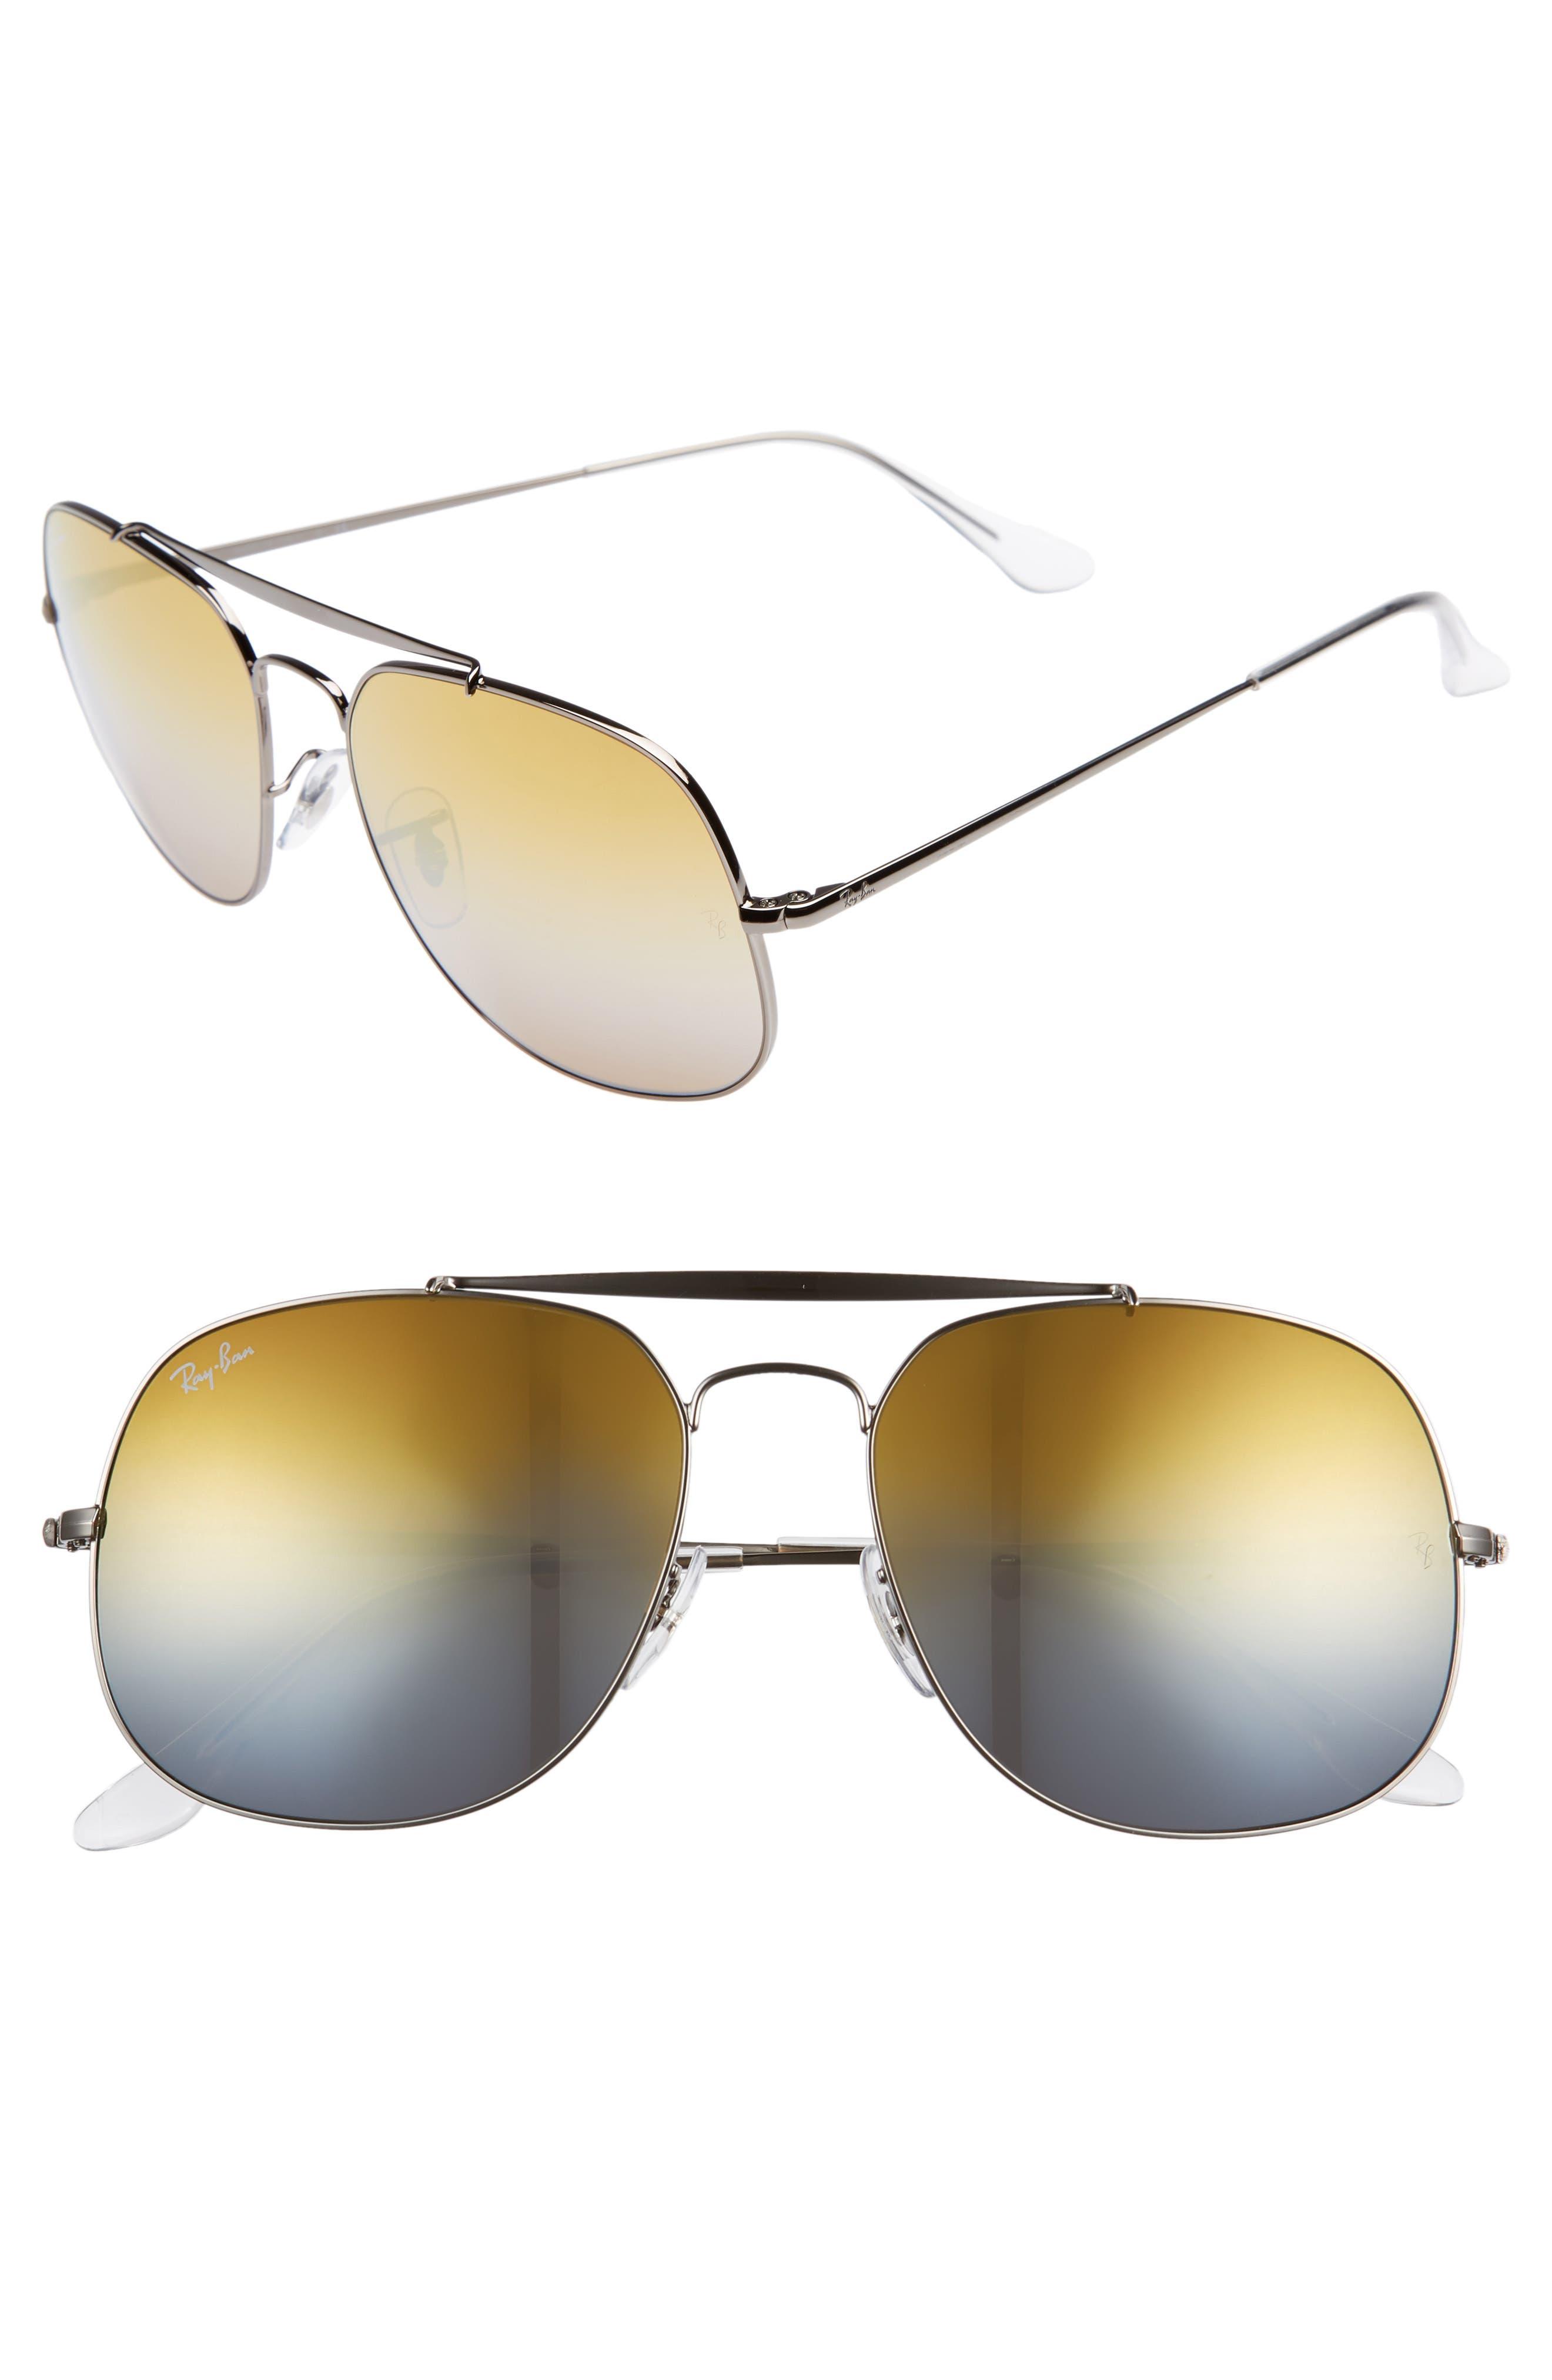 57mm Aviator Sunglasses,                             Main thumbnail 1, color,                             Grey Orange